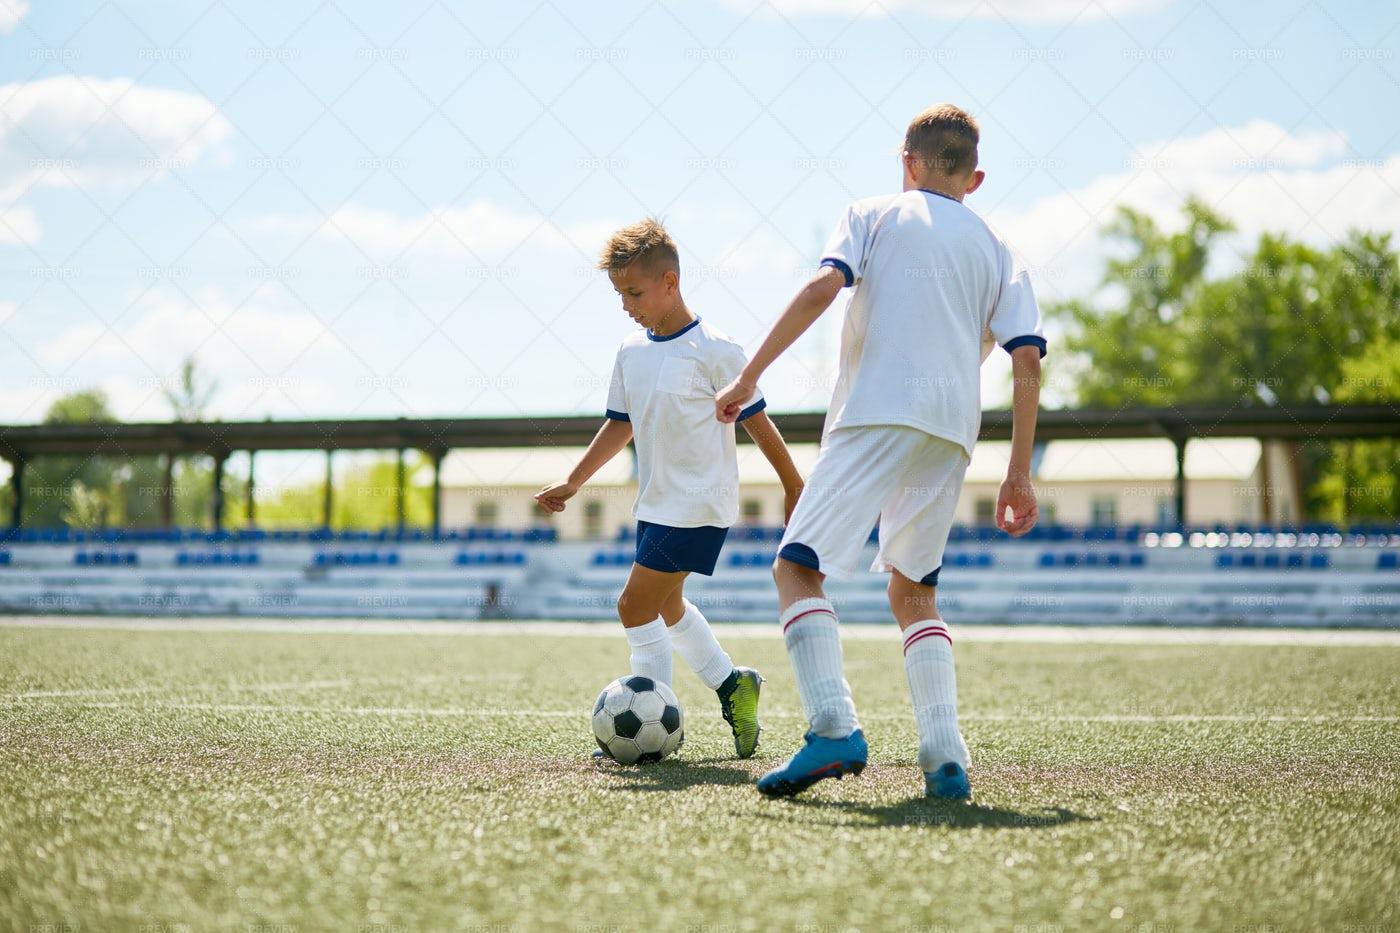 Boys Playing  Football Outdoors: Stock Photos